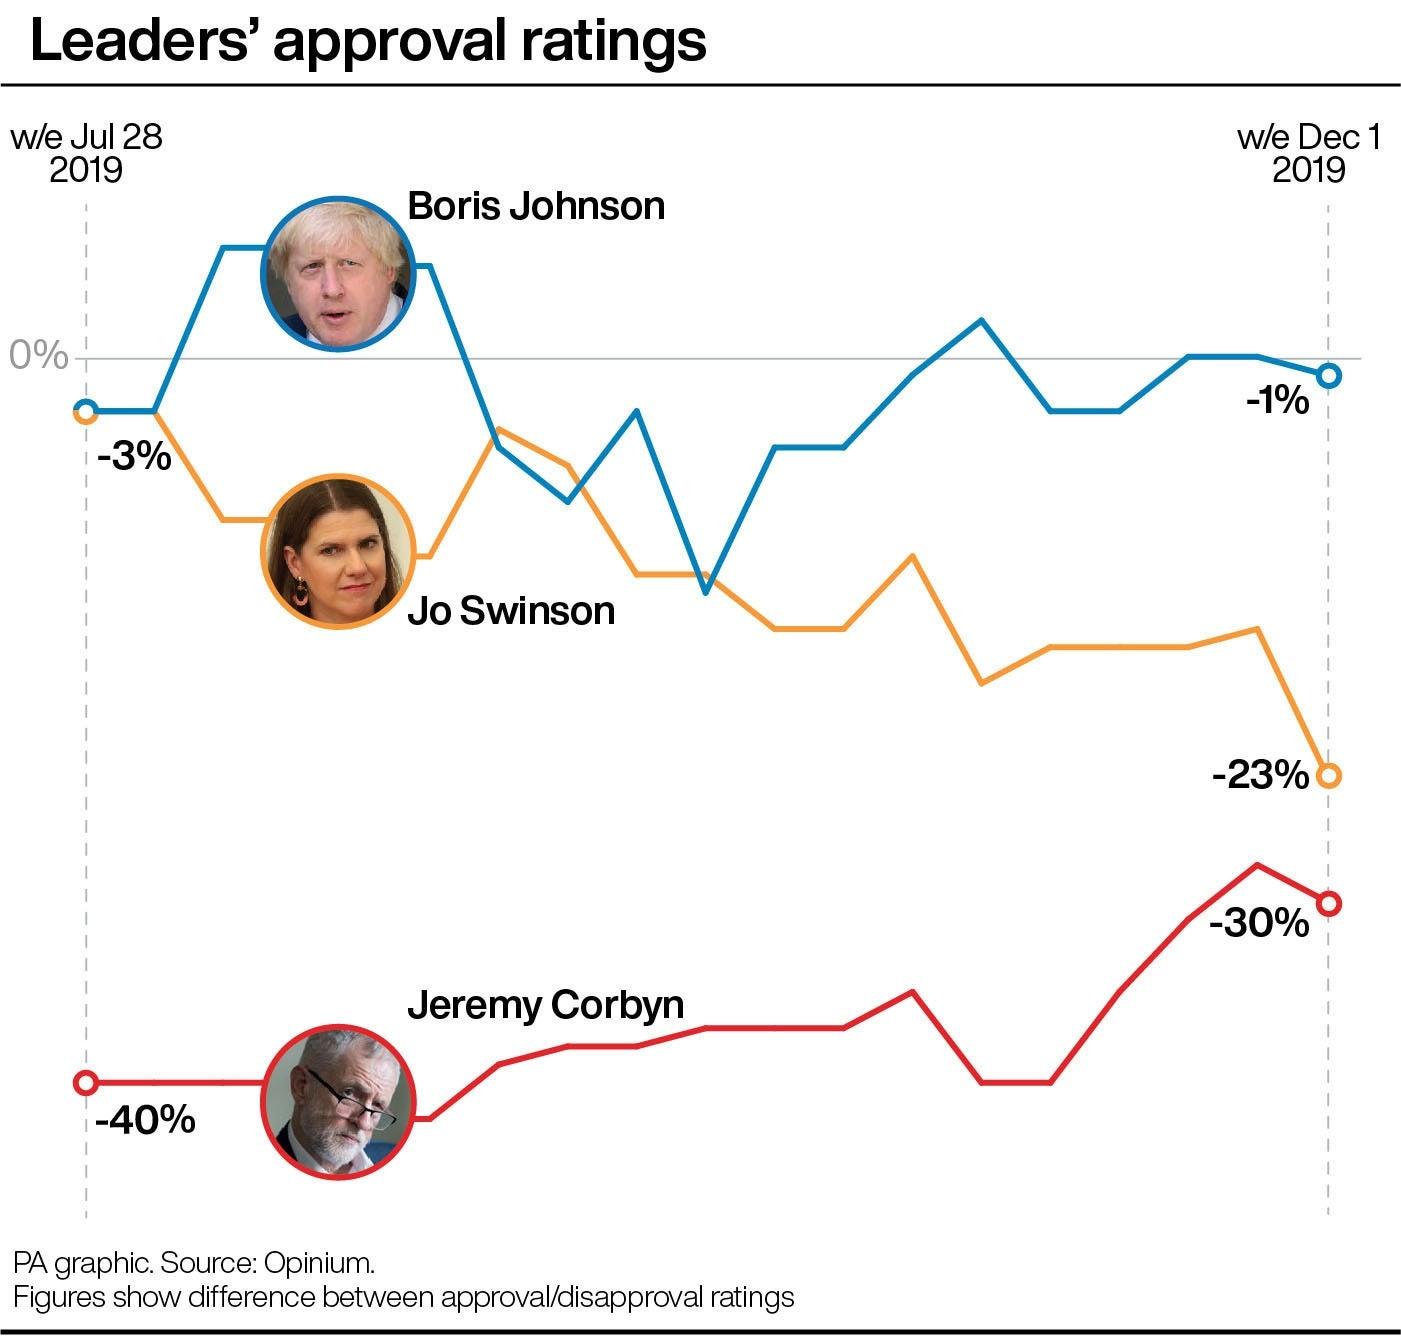 Leaders' approval ratings, July-December